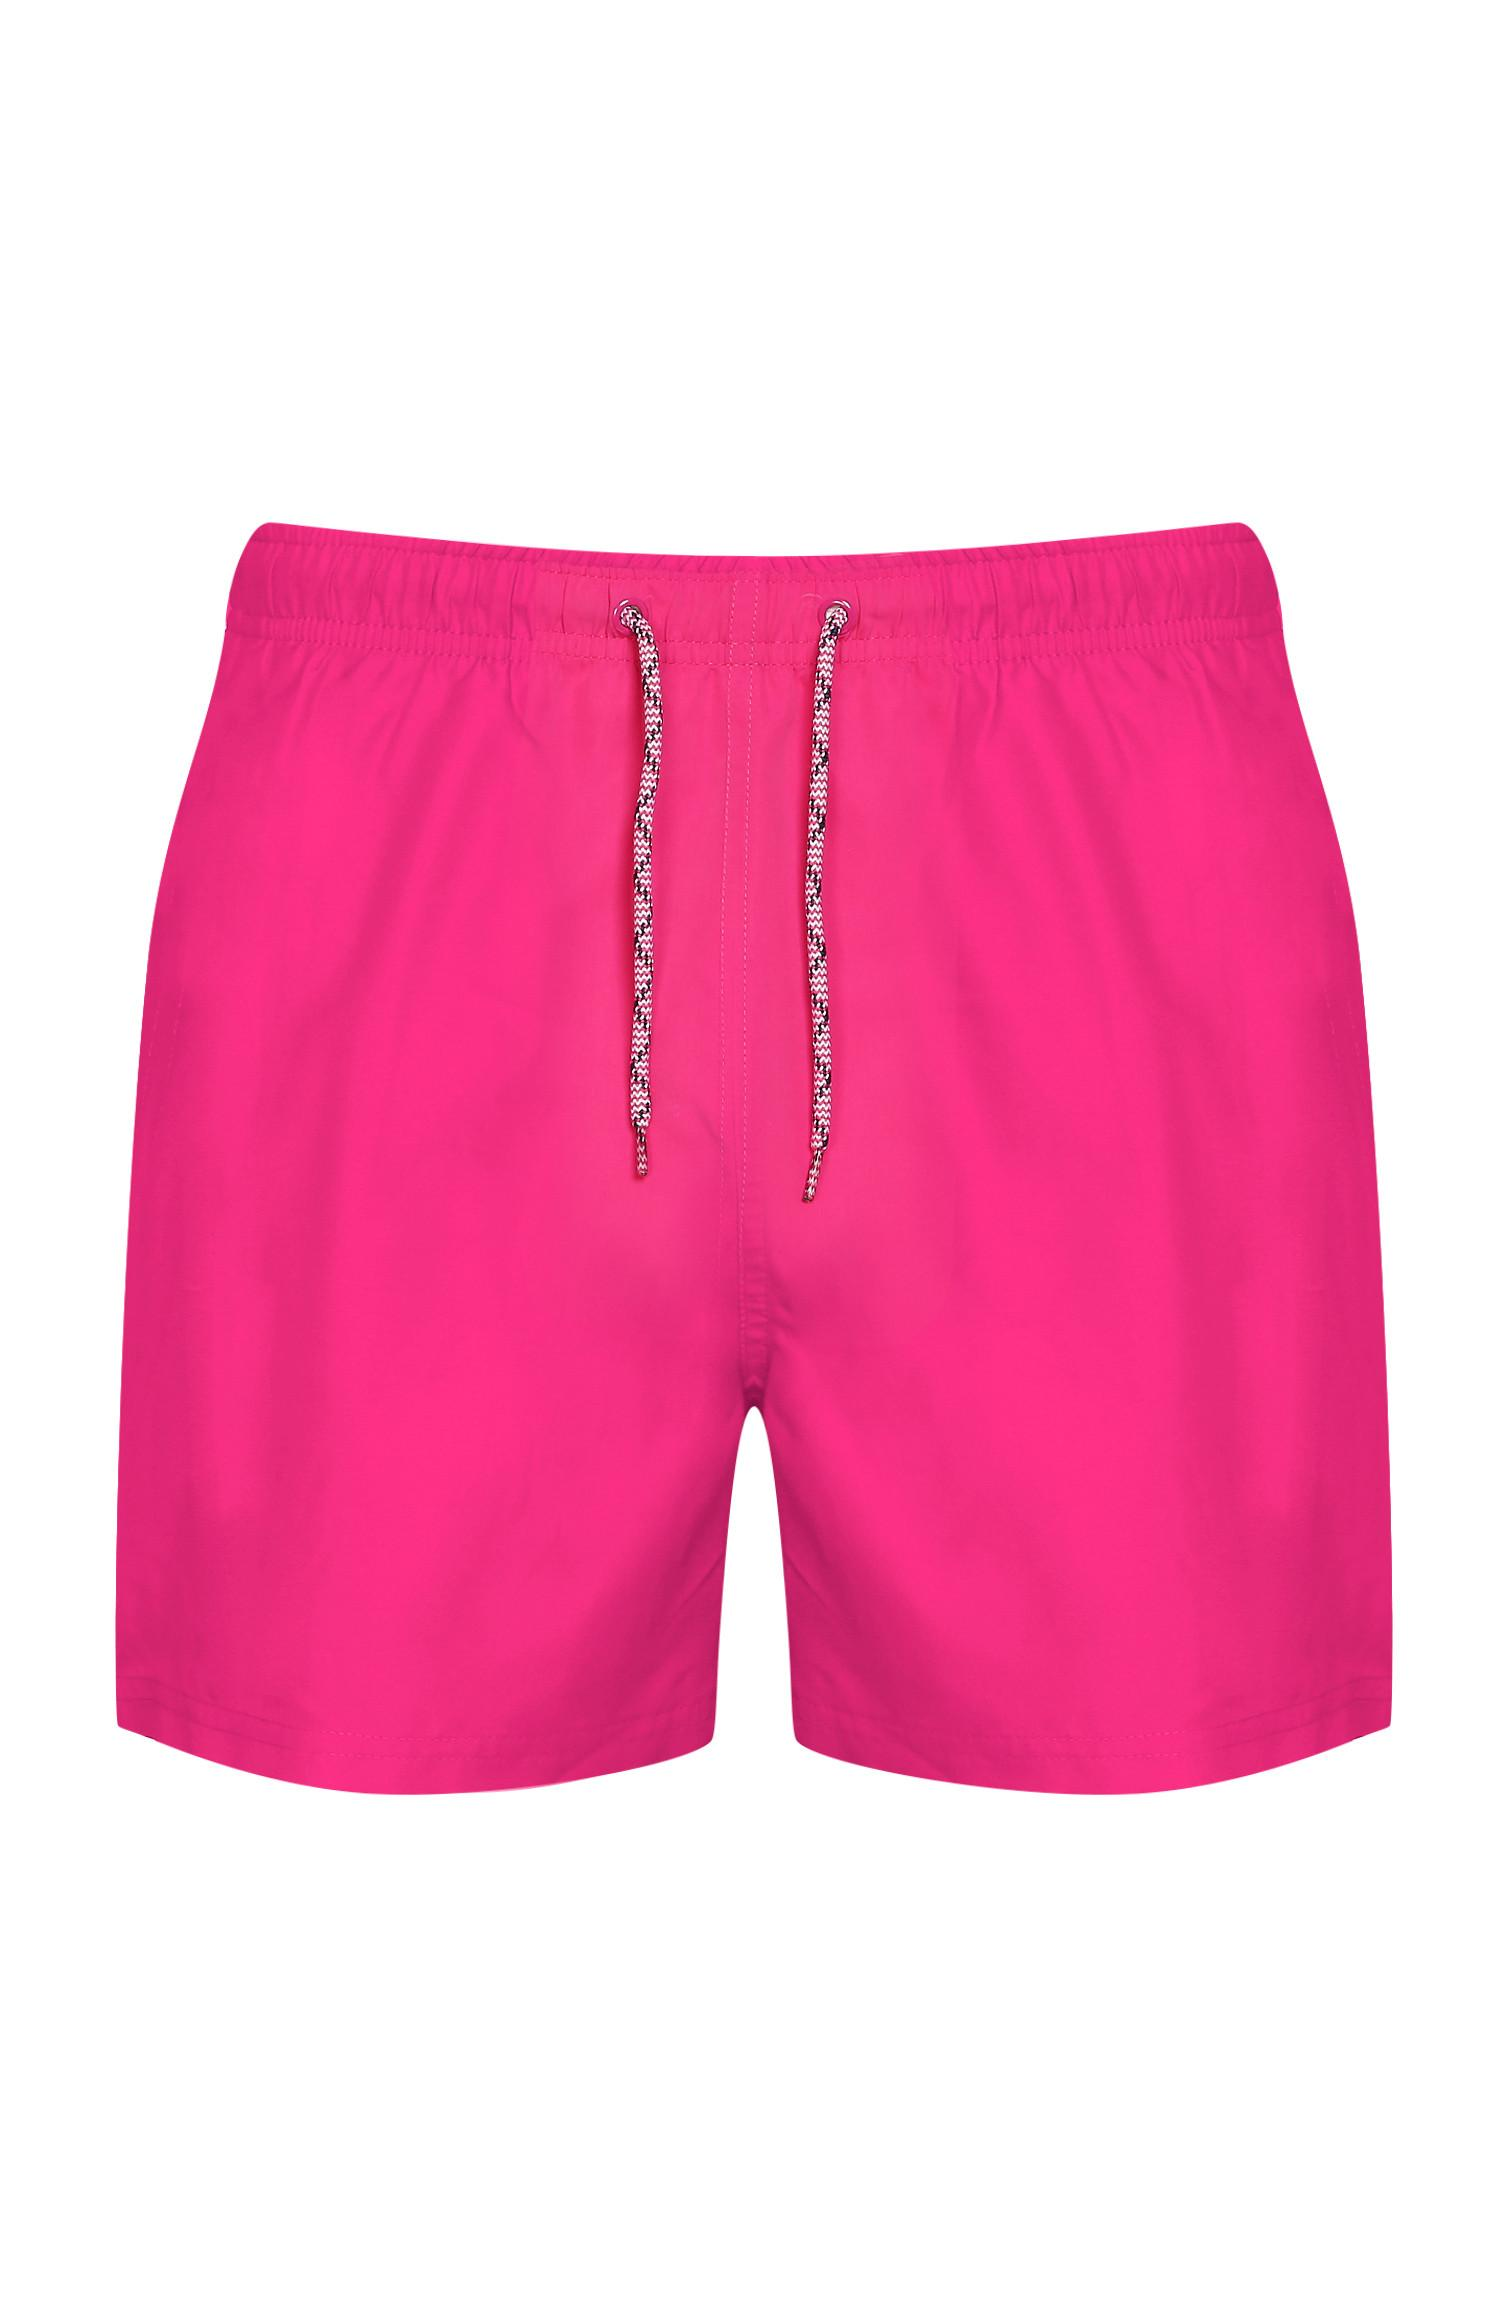 Pink Swim Shorts